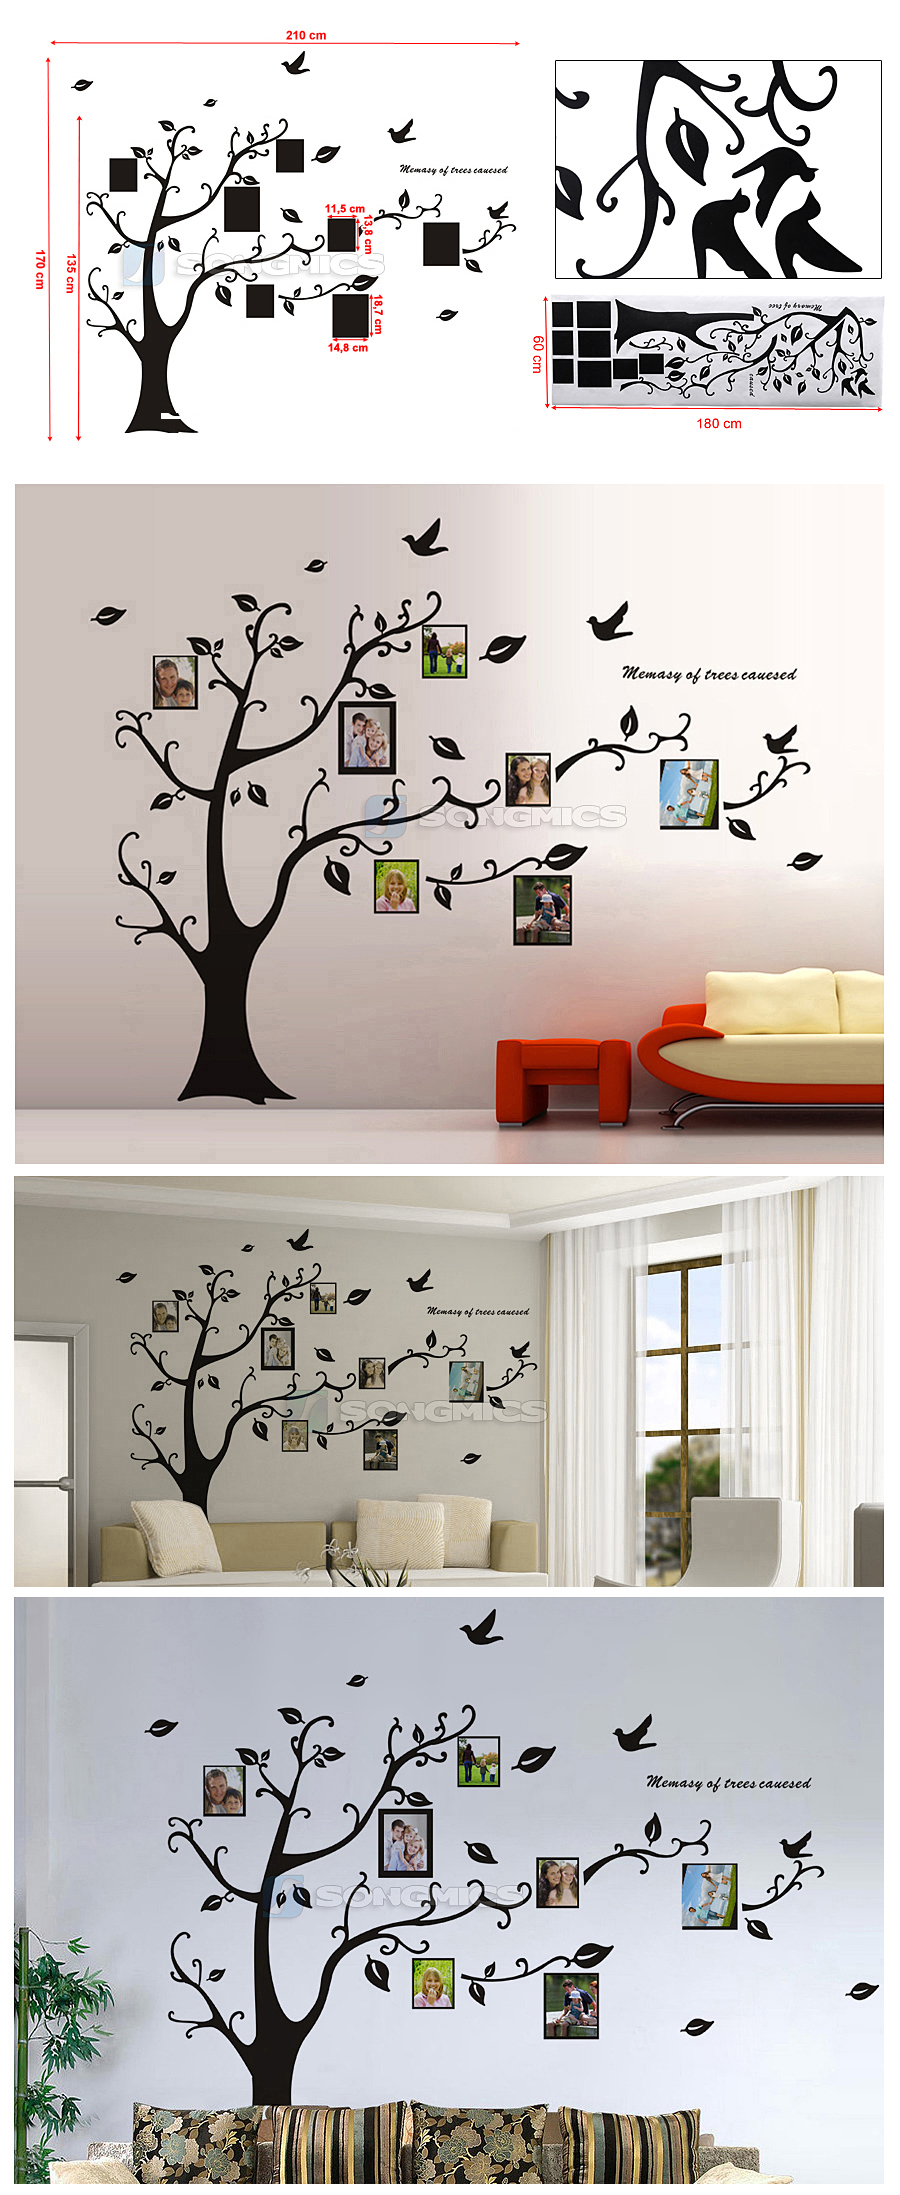 xxl wandtattoo baum v gel foto bilderrahmen wandaufkleber wohnzimmer gro fwt04h ebay. Black Bedroom Furniture Sets. Home Design Ideas